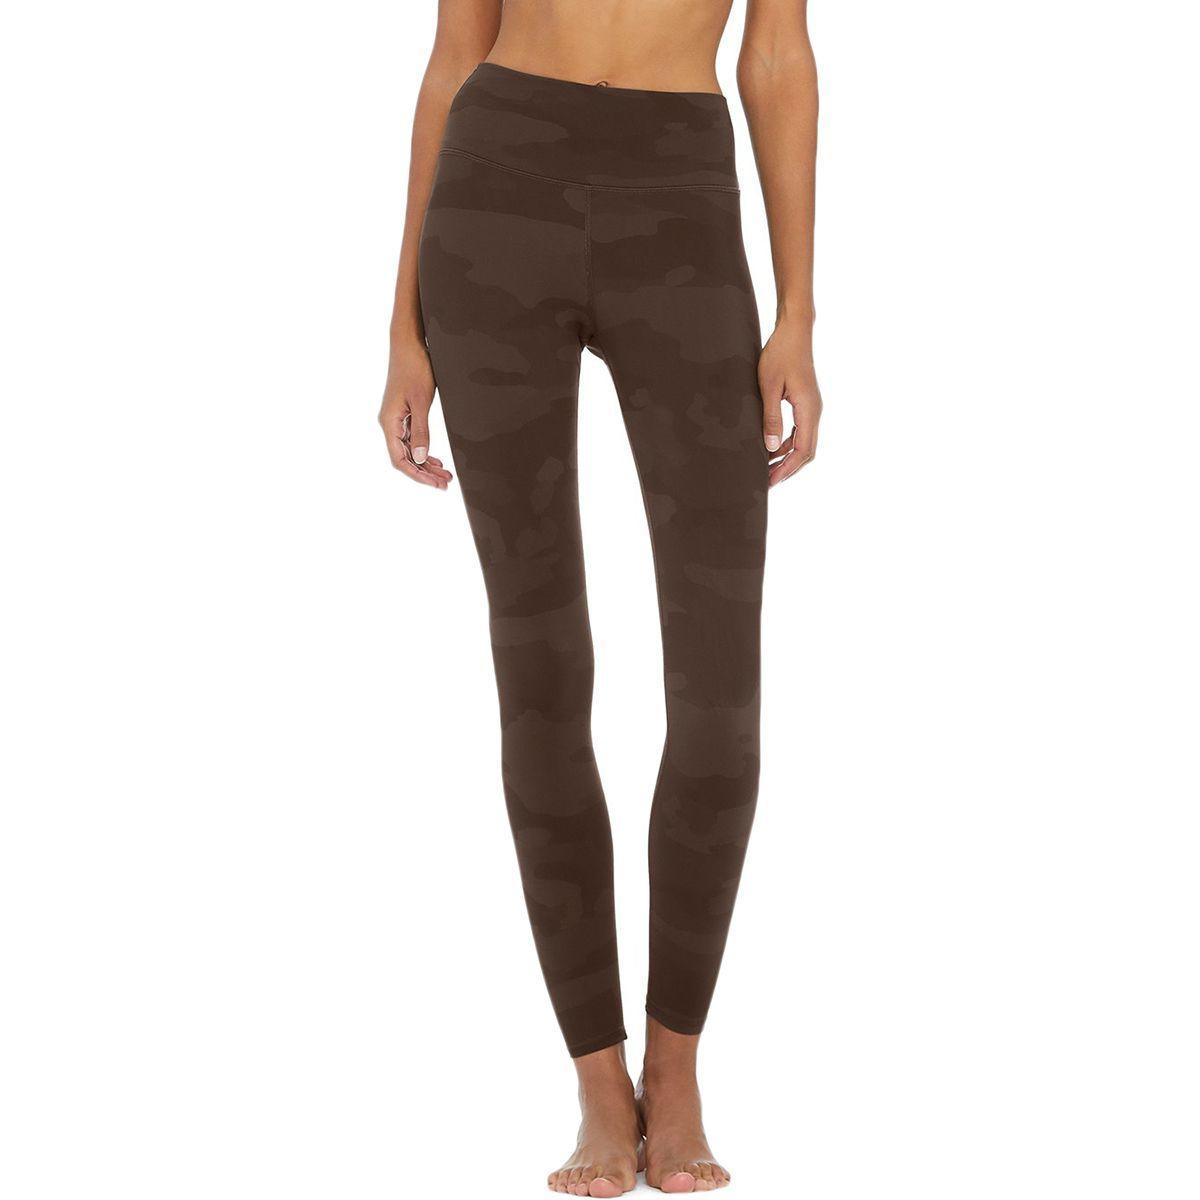 Alo Yoga High-Waist Vapor Legging - Women's